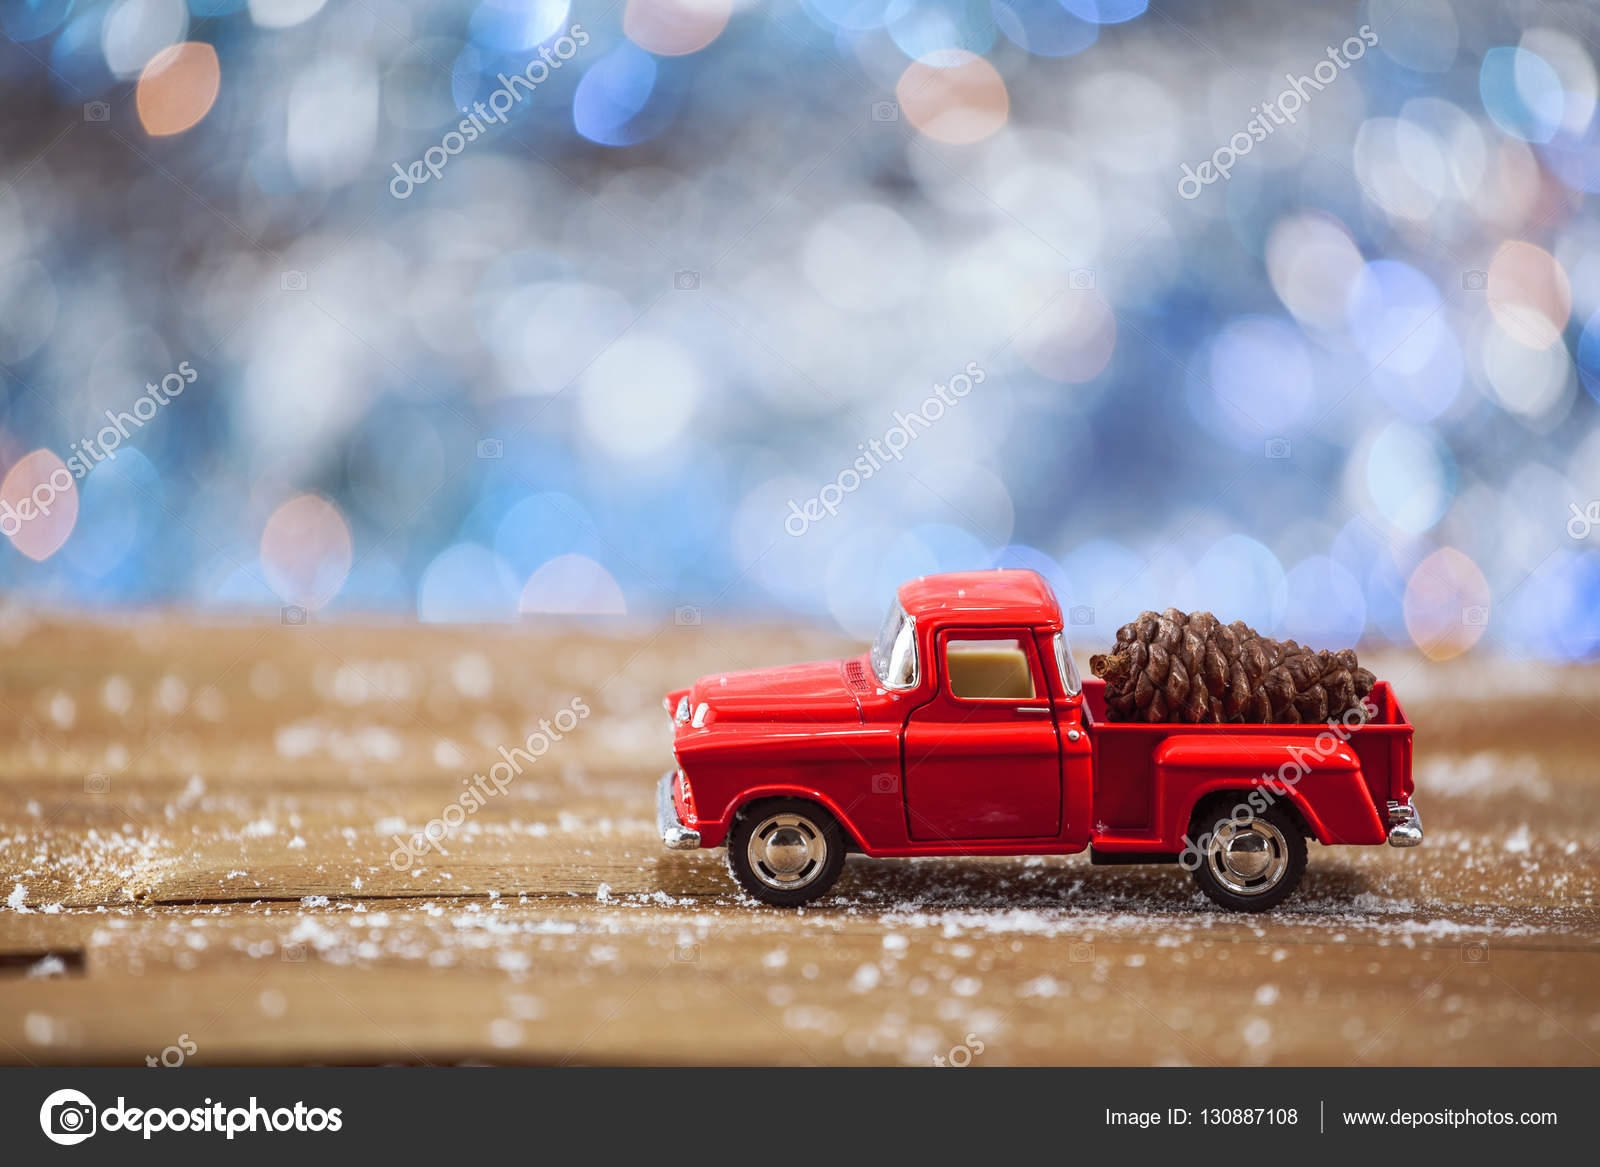 Carro De Juguete De Navidad Con Sobre Mesa De Madera Con Fondo Azul